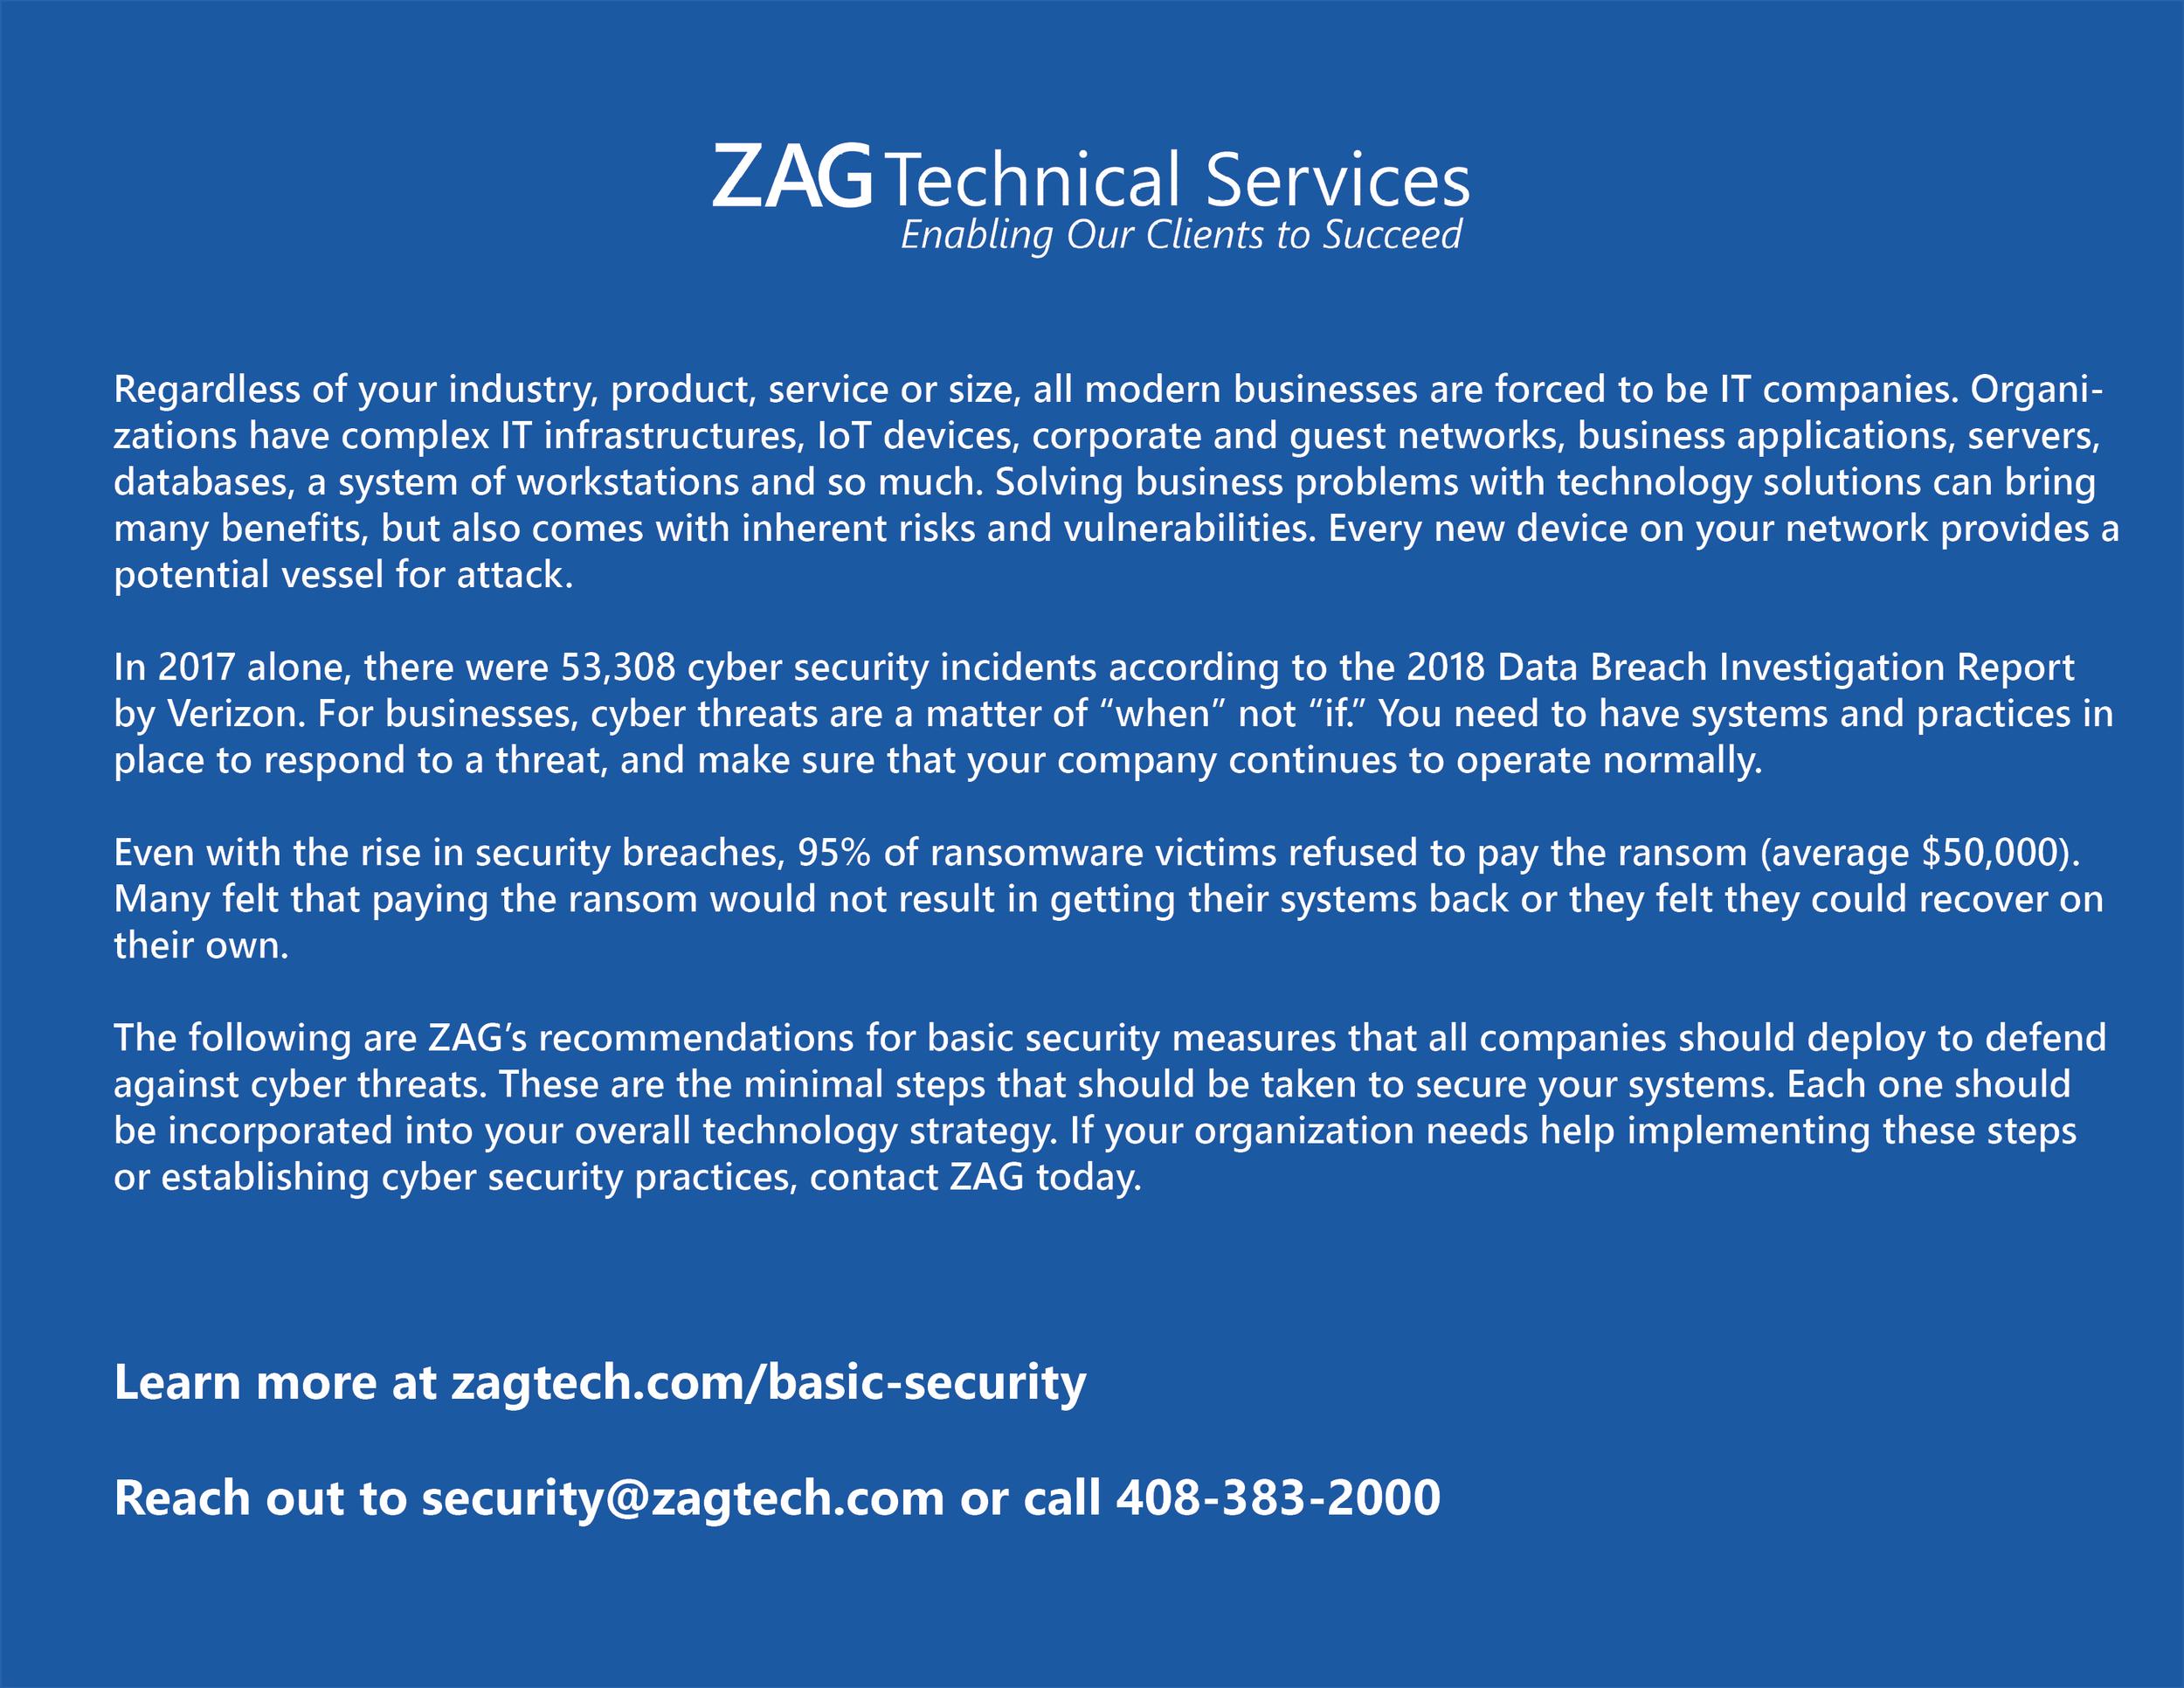 Contact ZAG if You Need Help